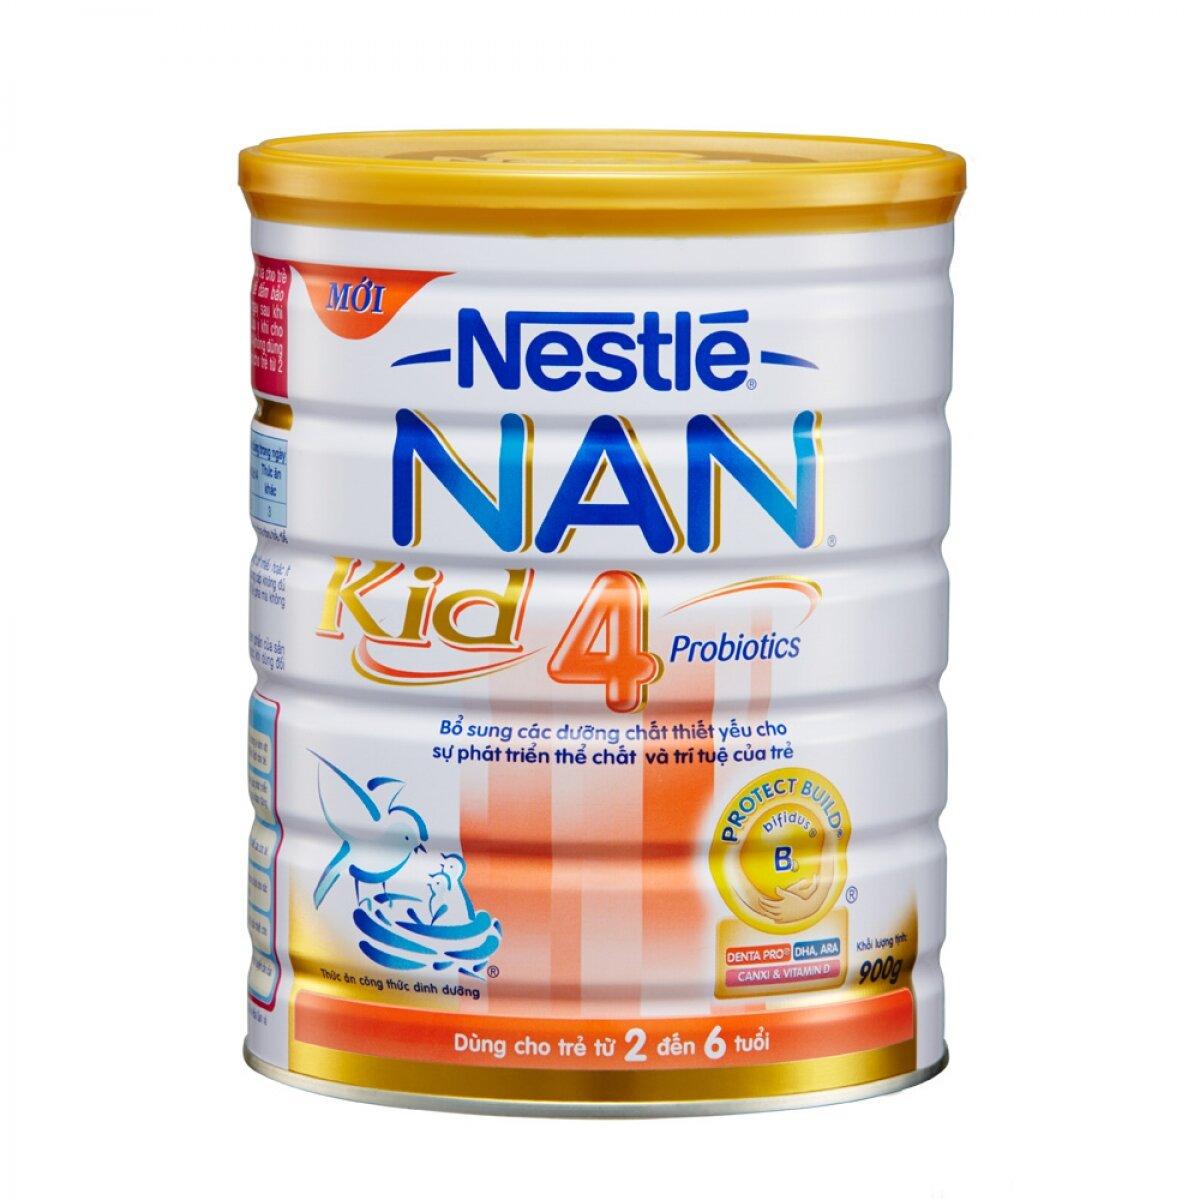 Sữa bột Nestlé NAN Kid 4